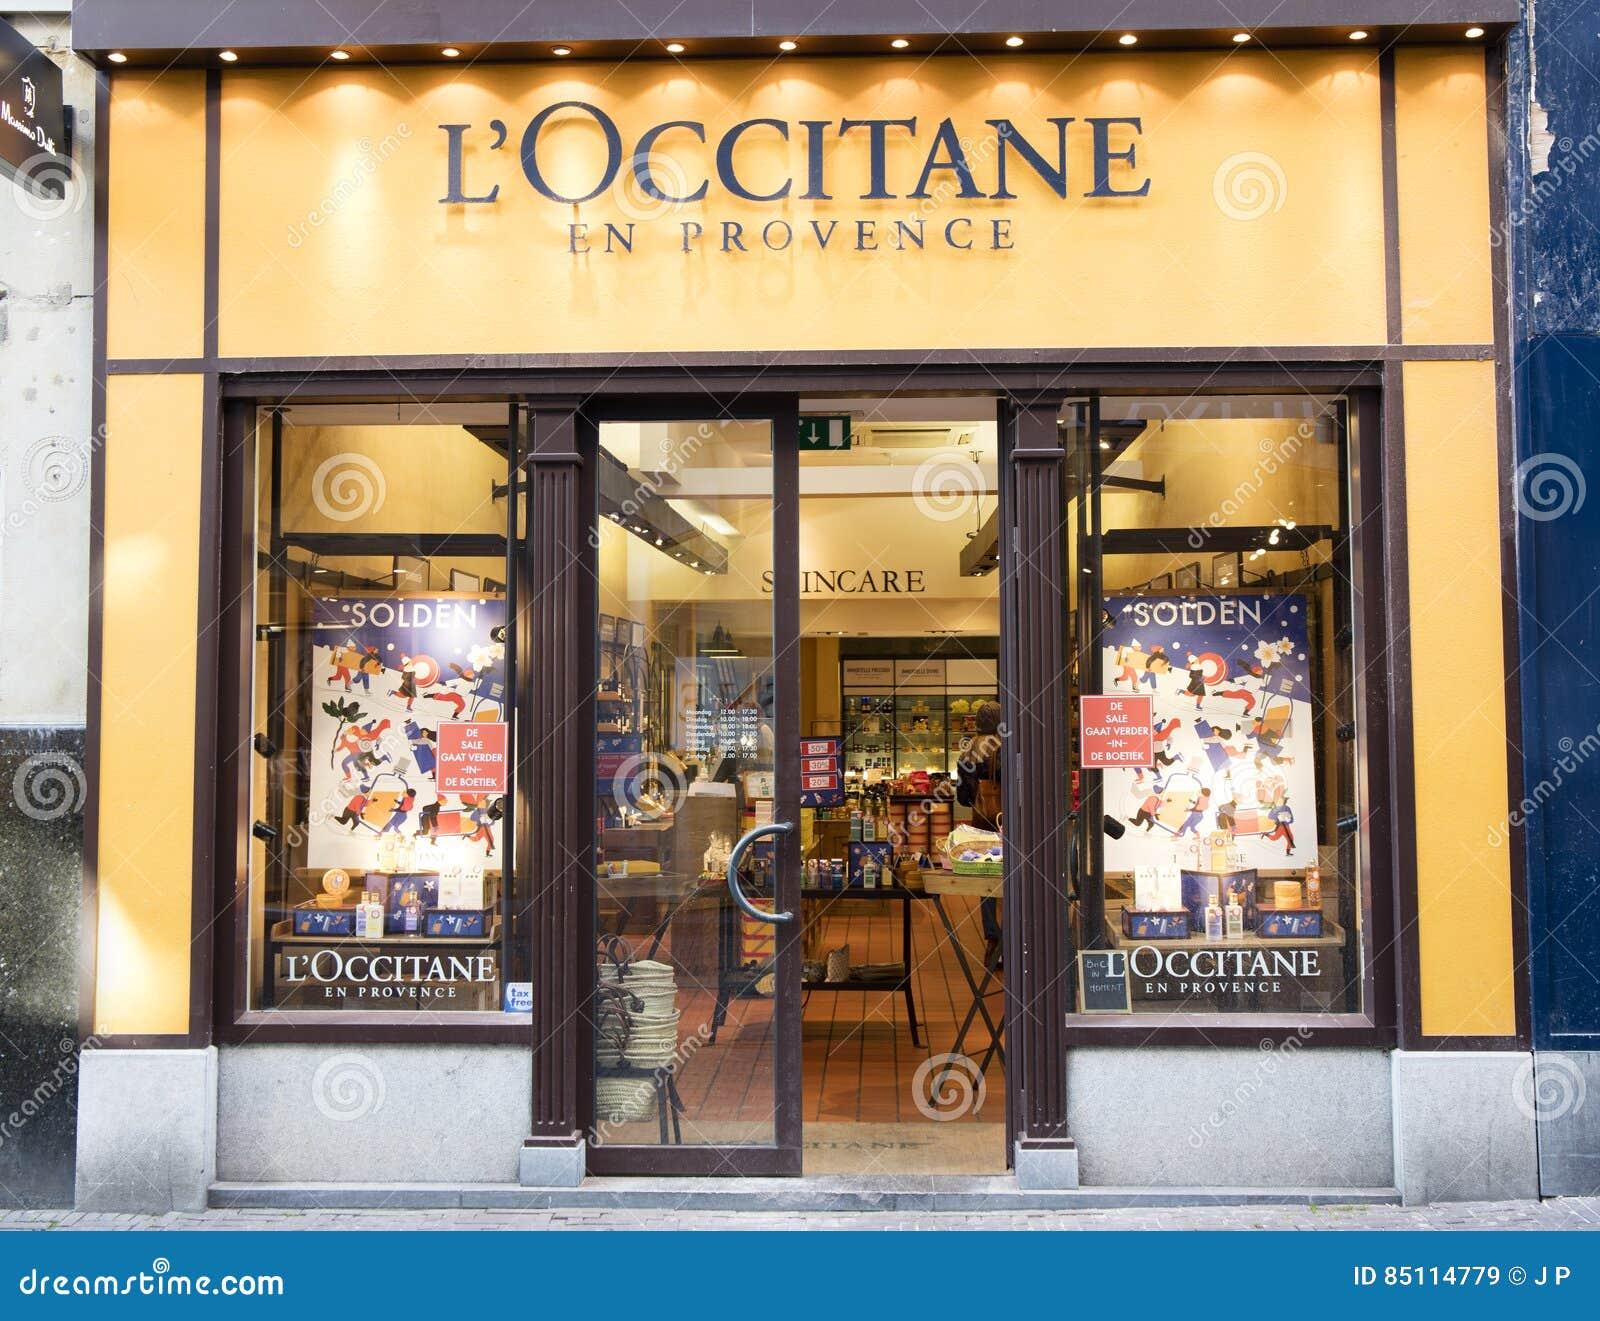 dd4fb7bed179f Fachada Do En Provence Do Loccitane Da Loja Imagem de Stock ...